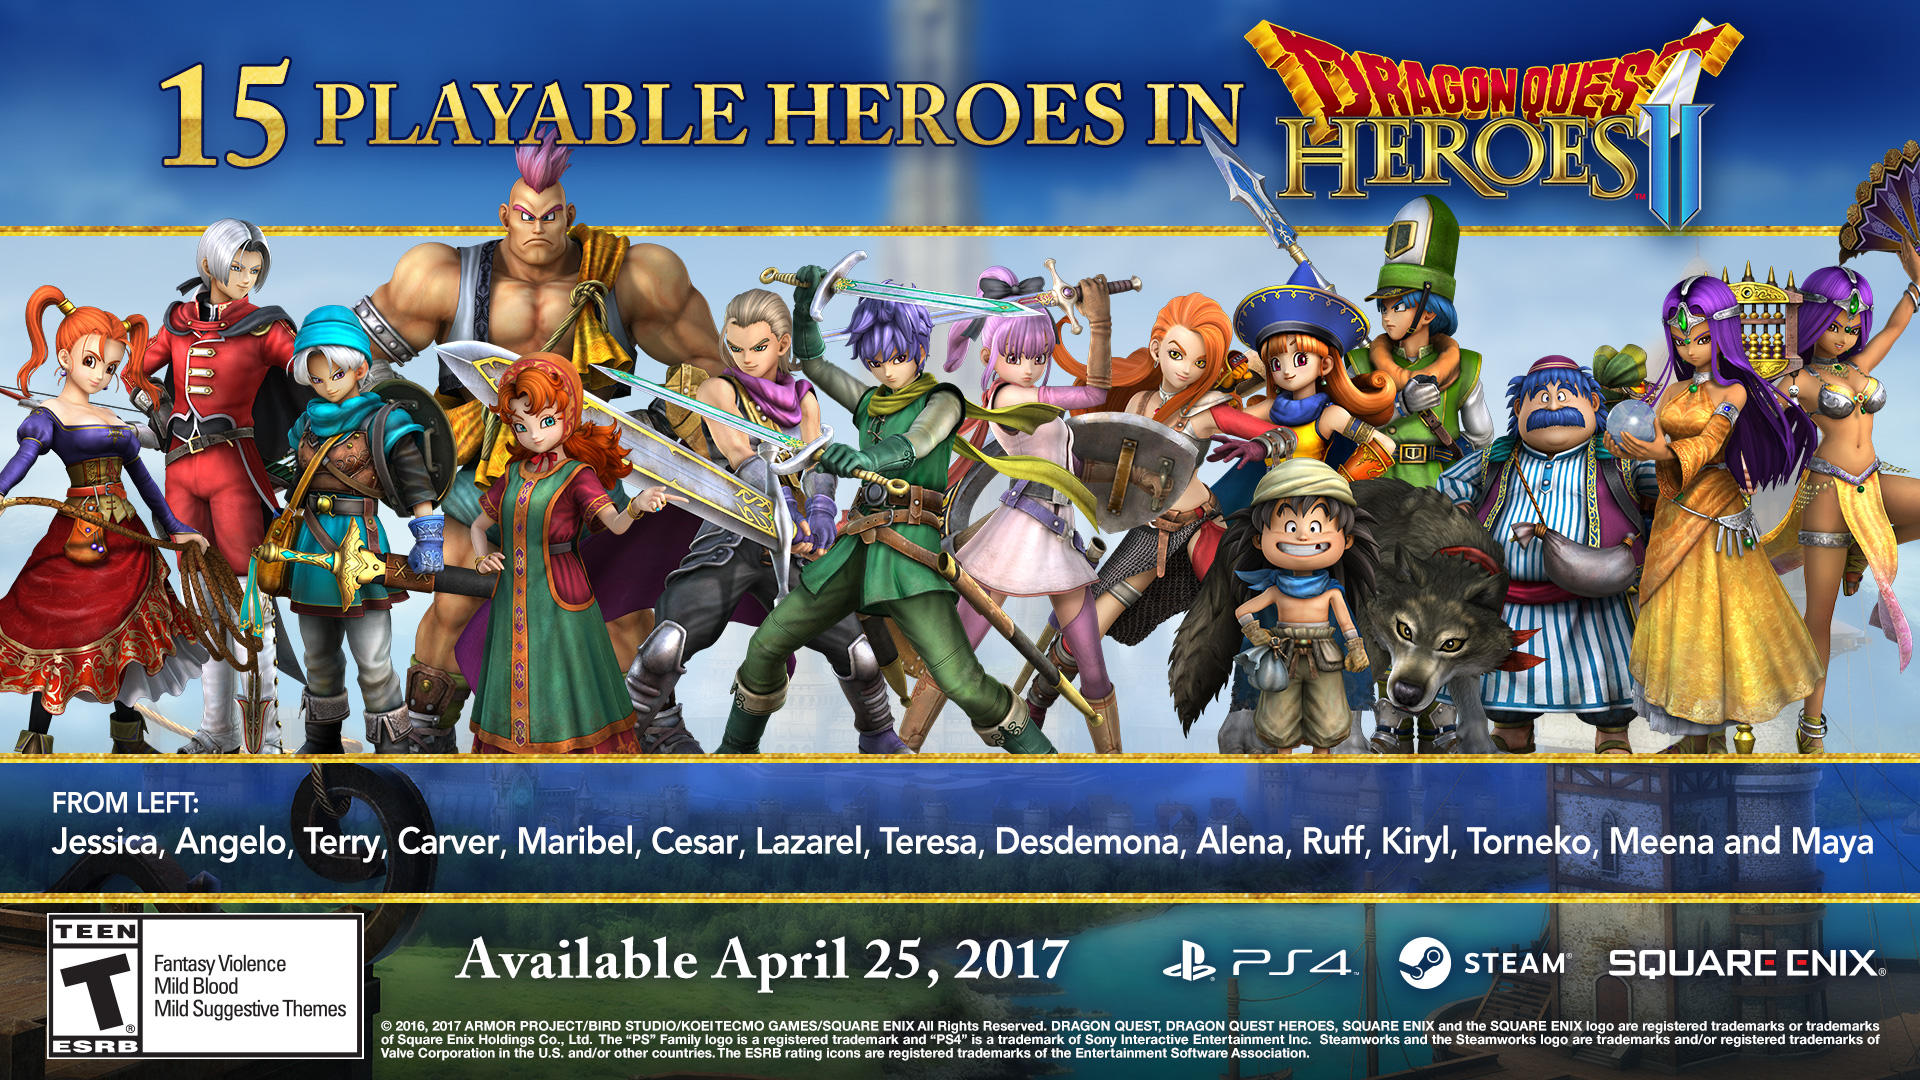 Dragon Quest Heroes II - Meet the Heroes: Alena, Kiryl, & Torneko